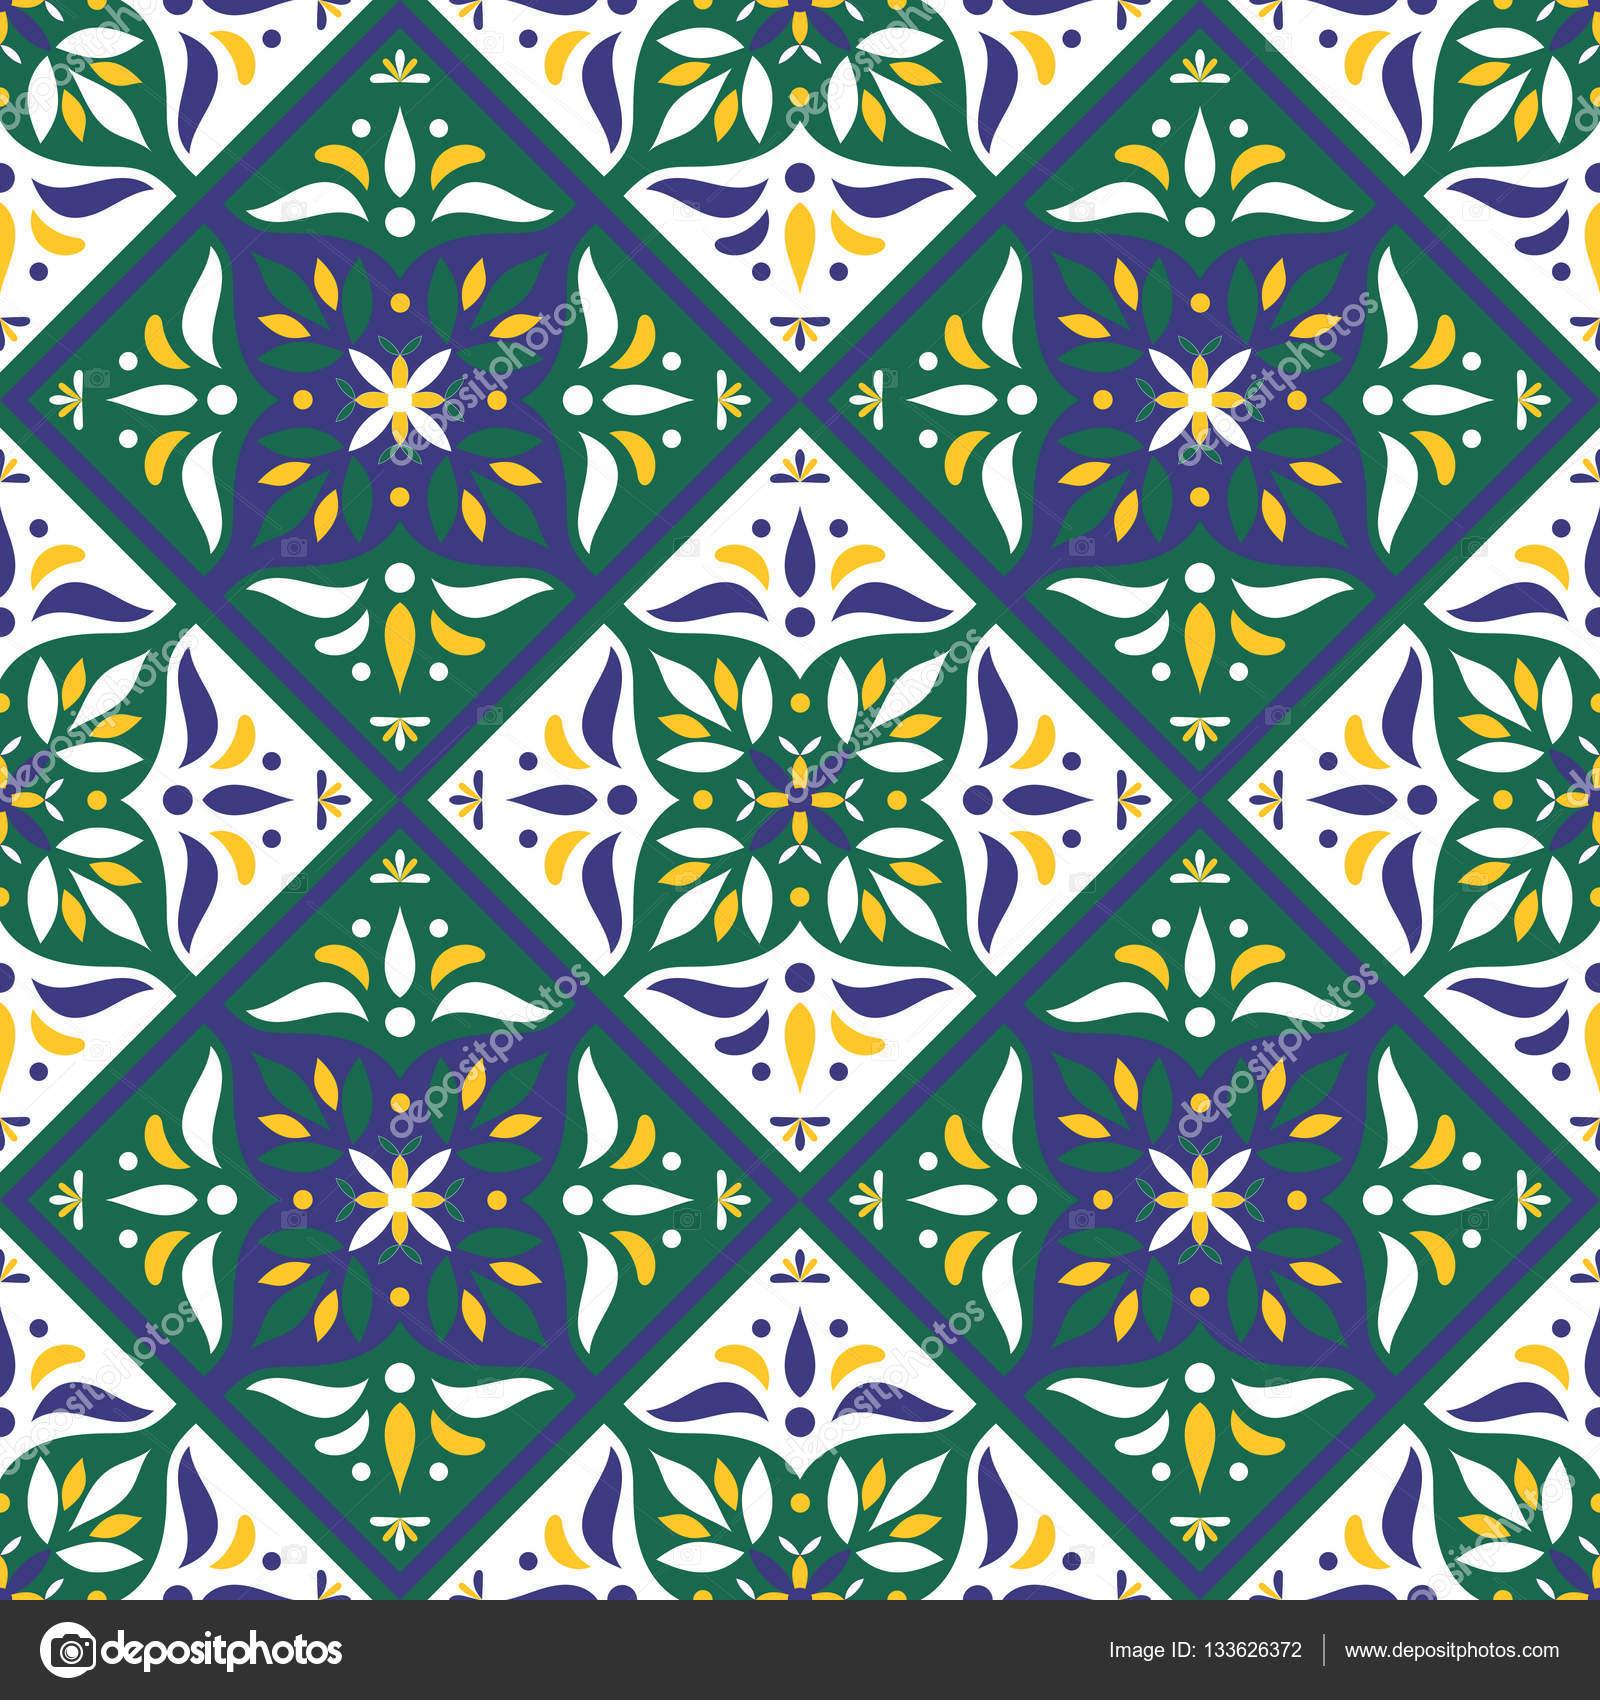 Italian ornaments - Tiles Pattern Vector With Diagonal Oriental Ornaments Portuguese Azulejo Mexican Talavera Spanish Italian Majolica Or Arabic Motifs